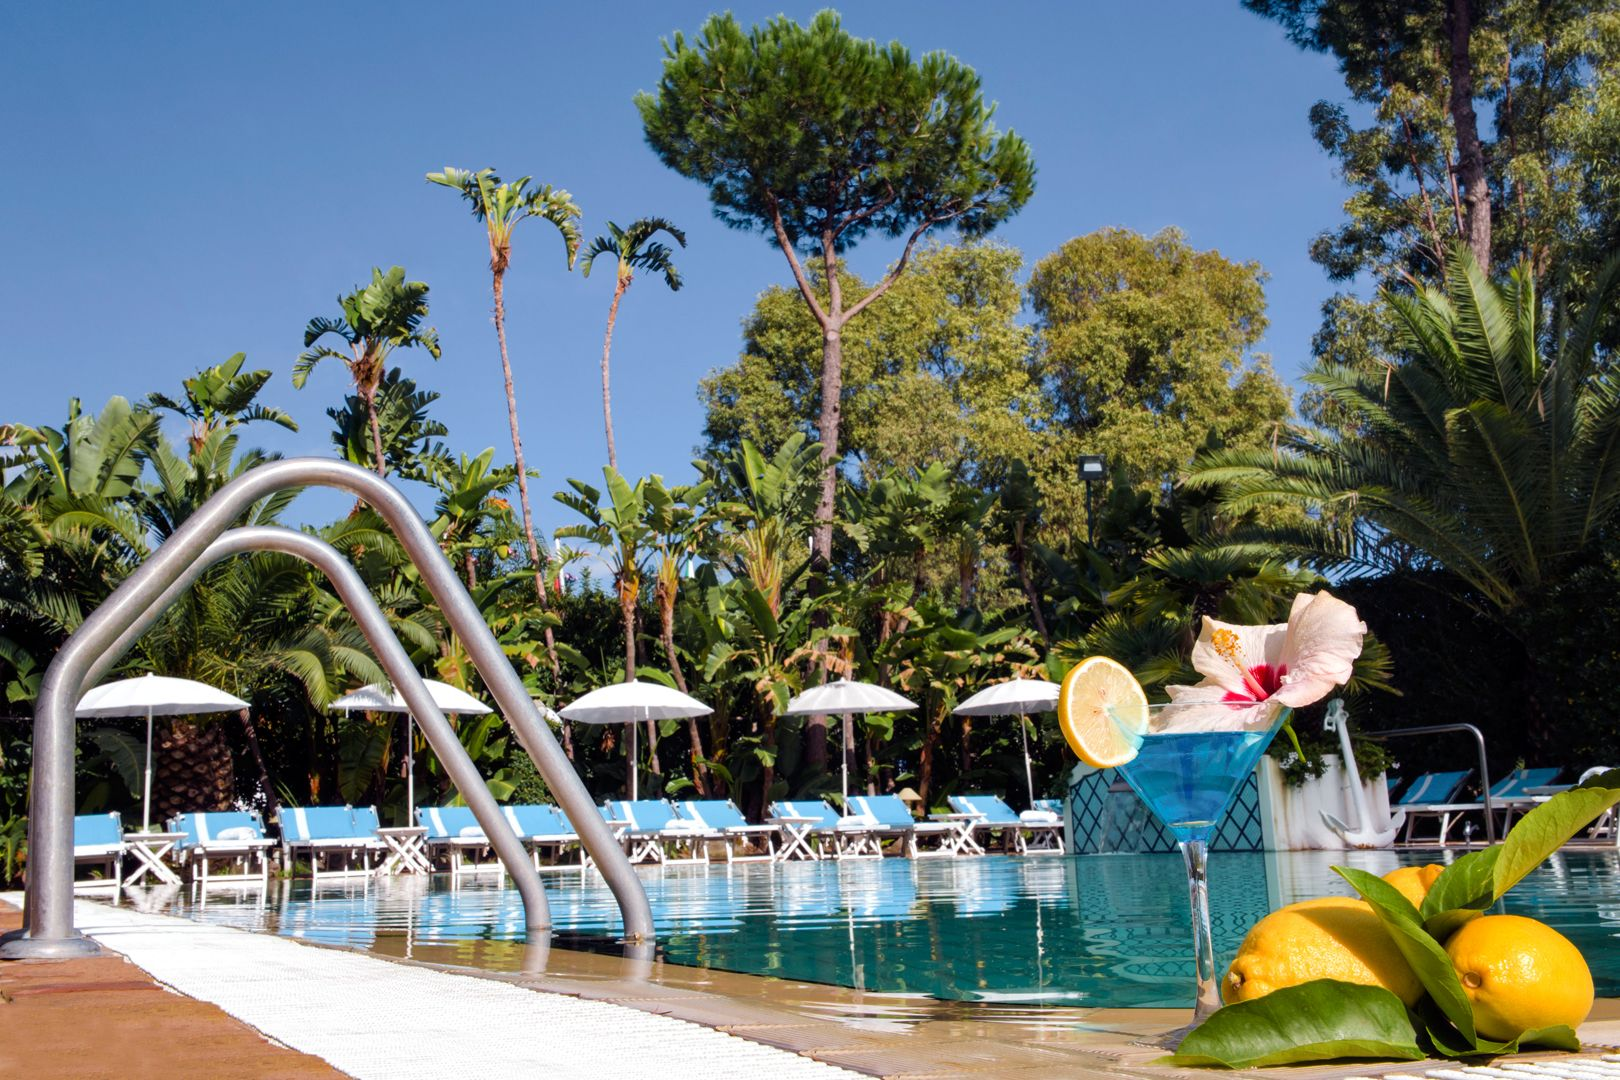 Hotel-central-park-ischia-13